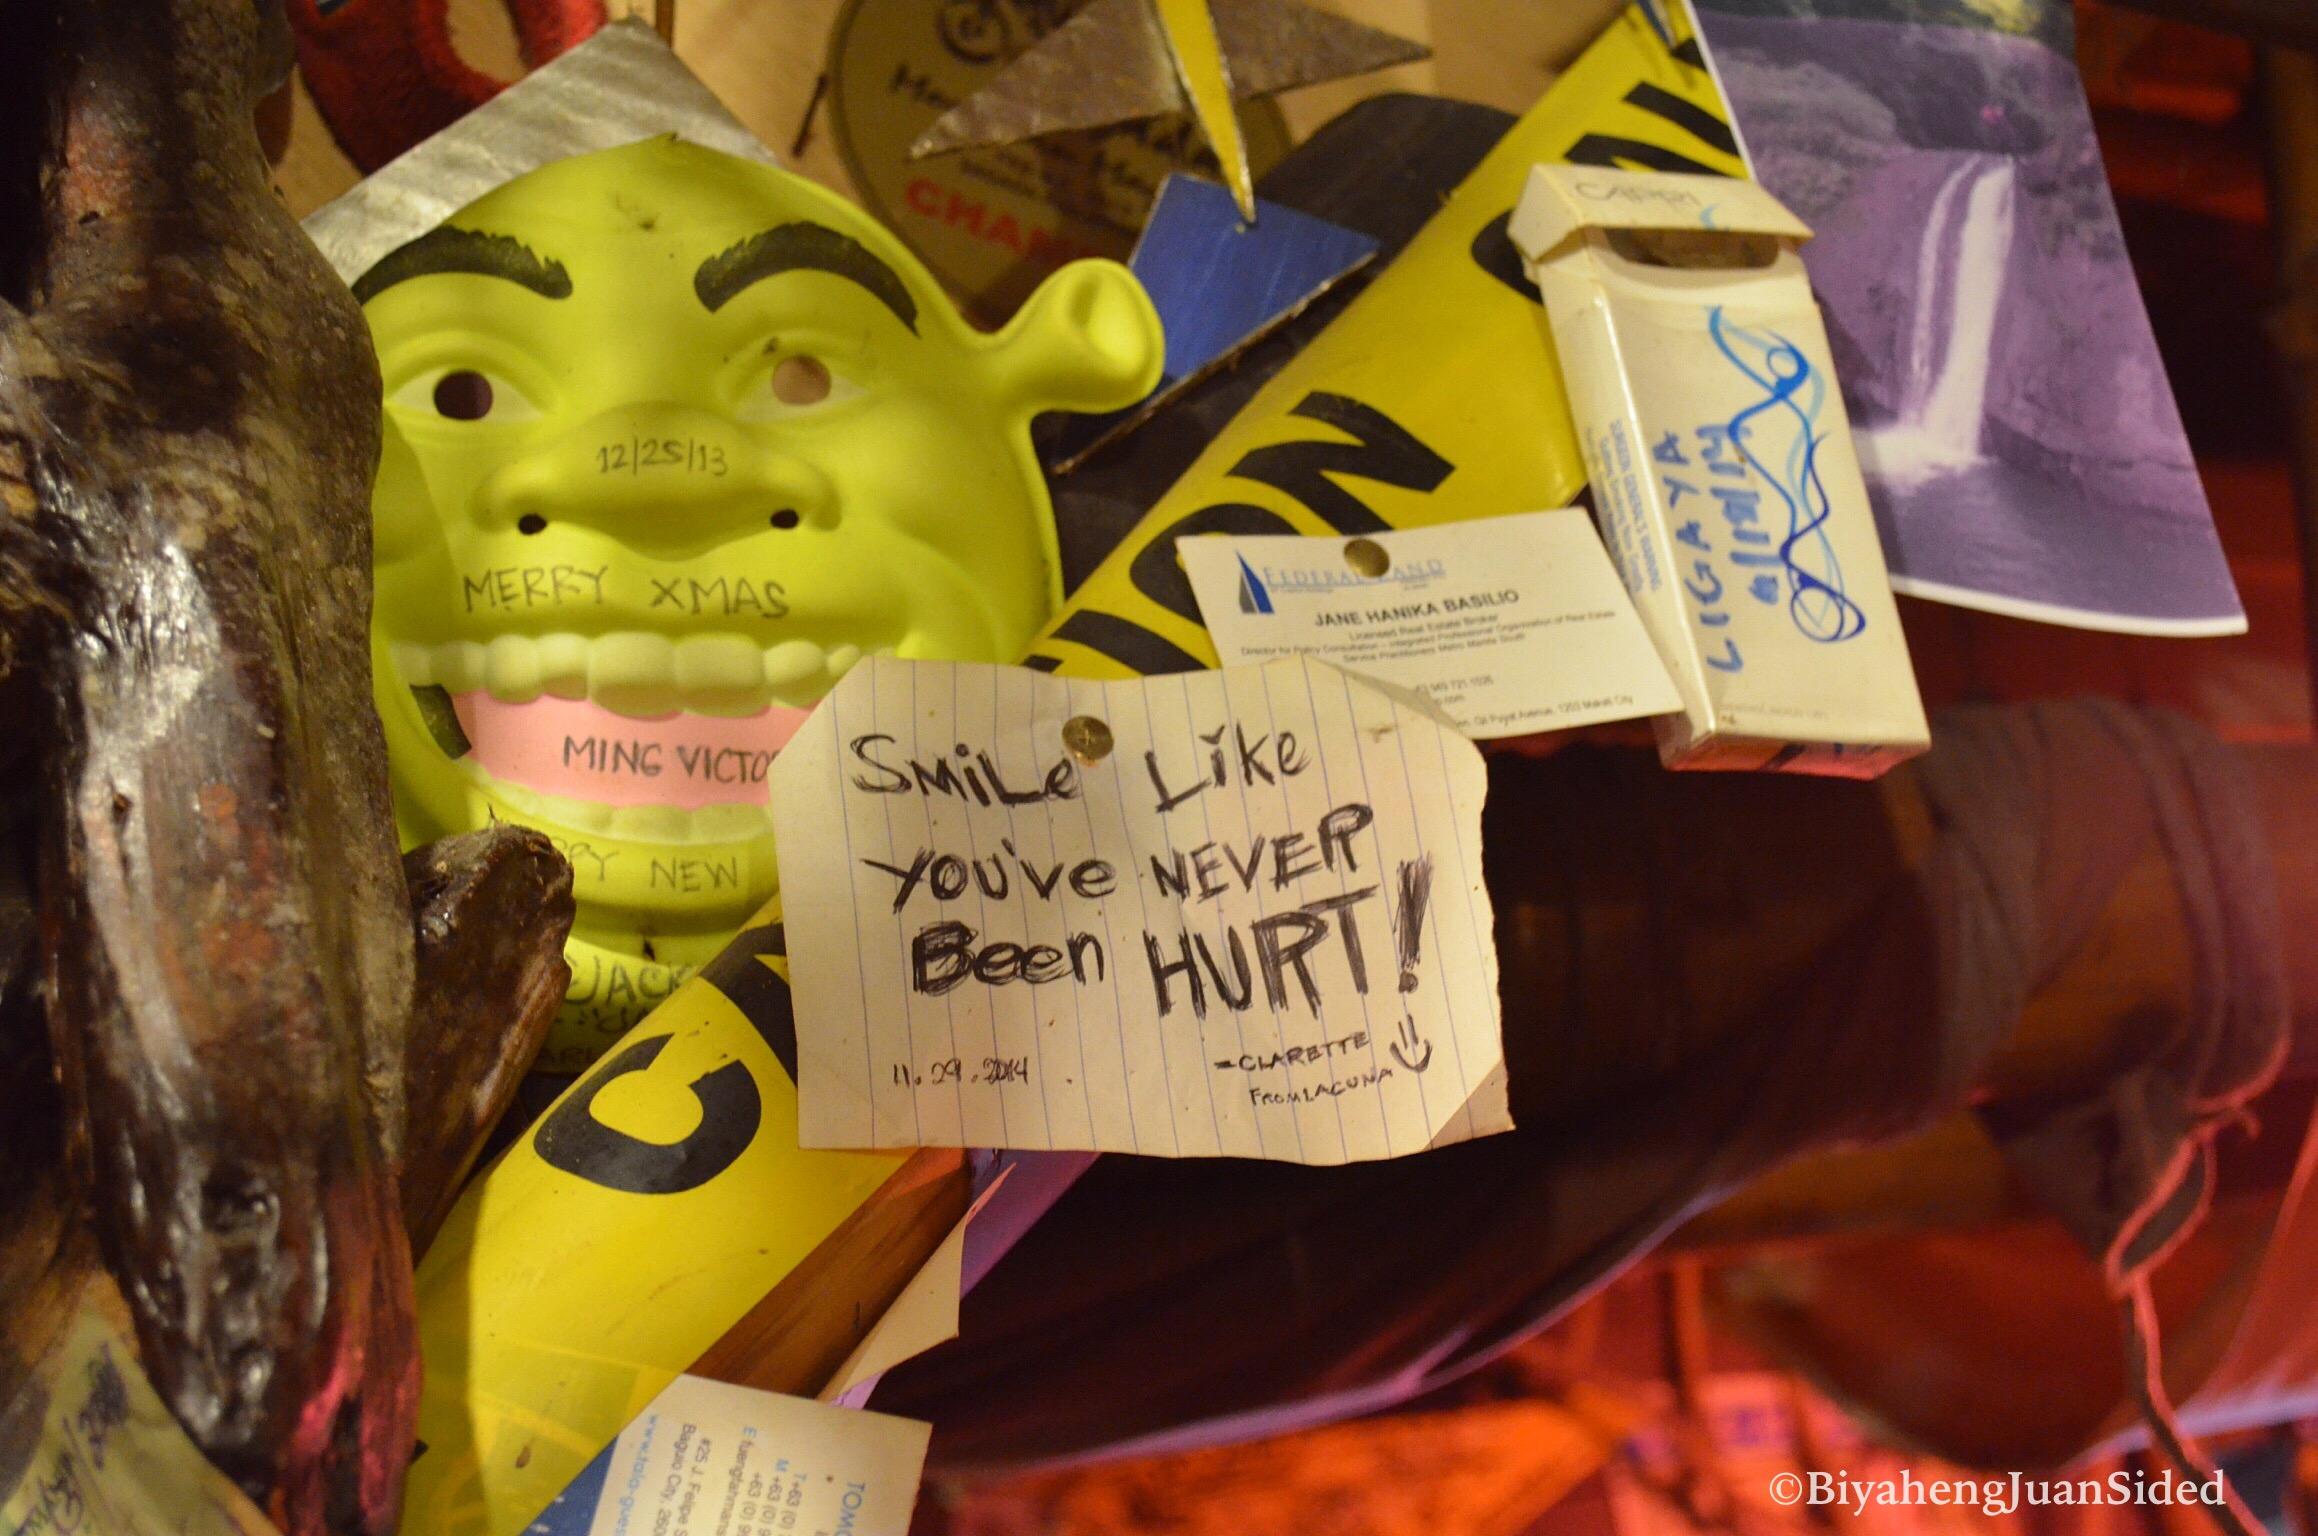 A Cafe where Broken Hearts Go – Biyaheng Juan-Sided